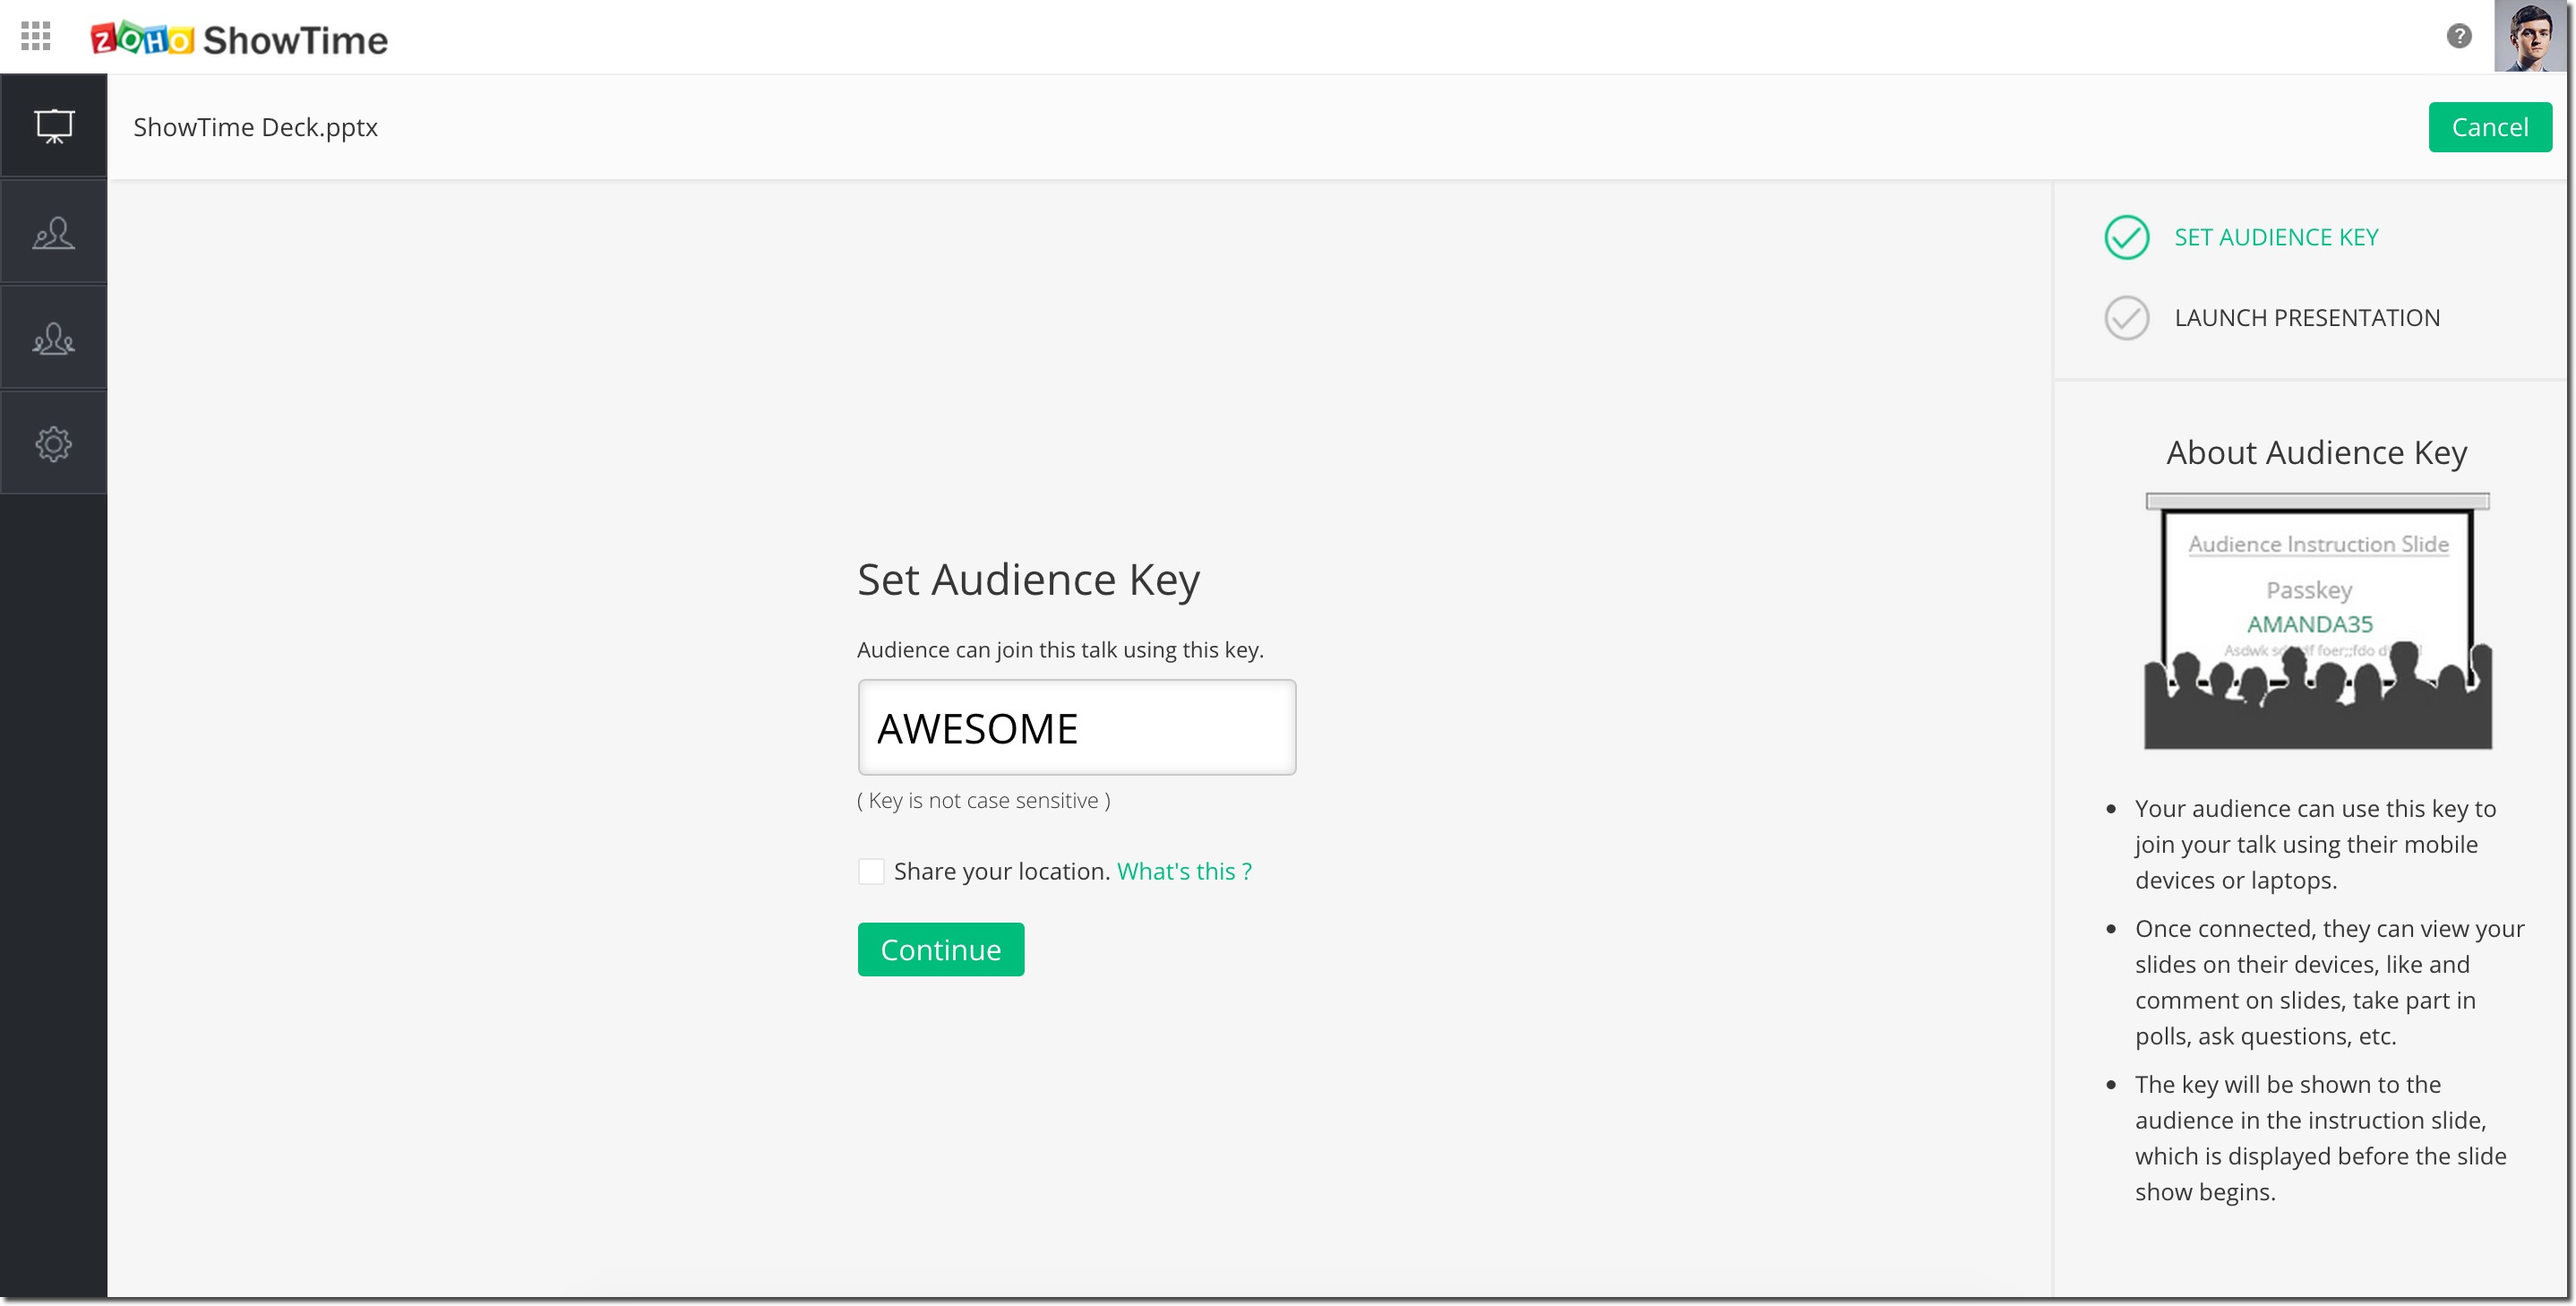 Zoho ShowTime audience key